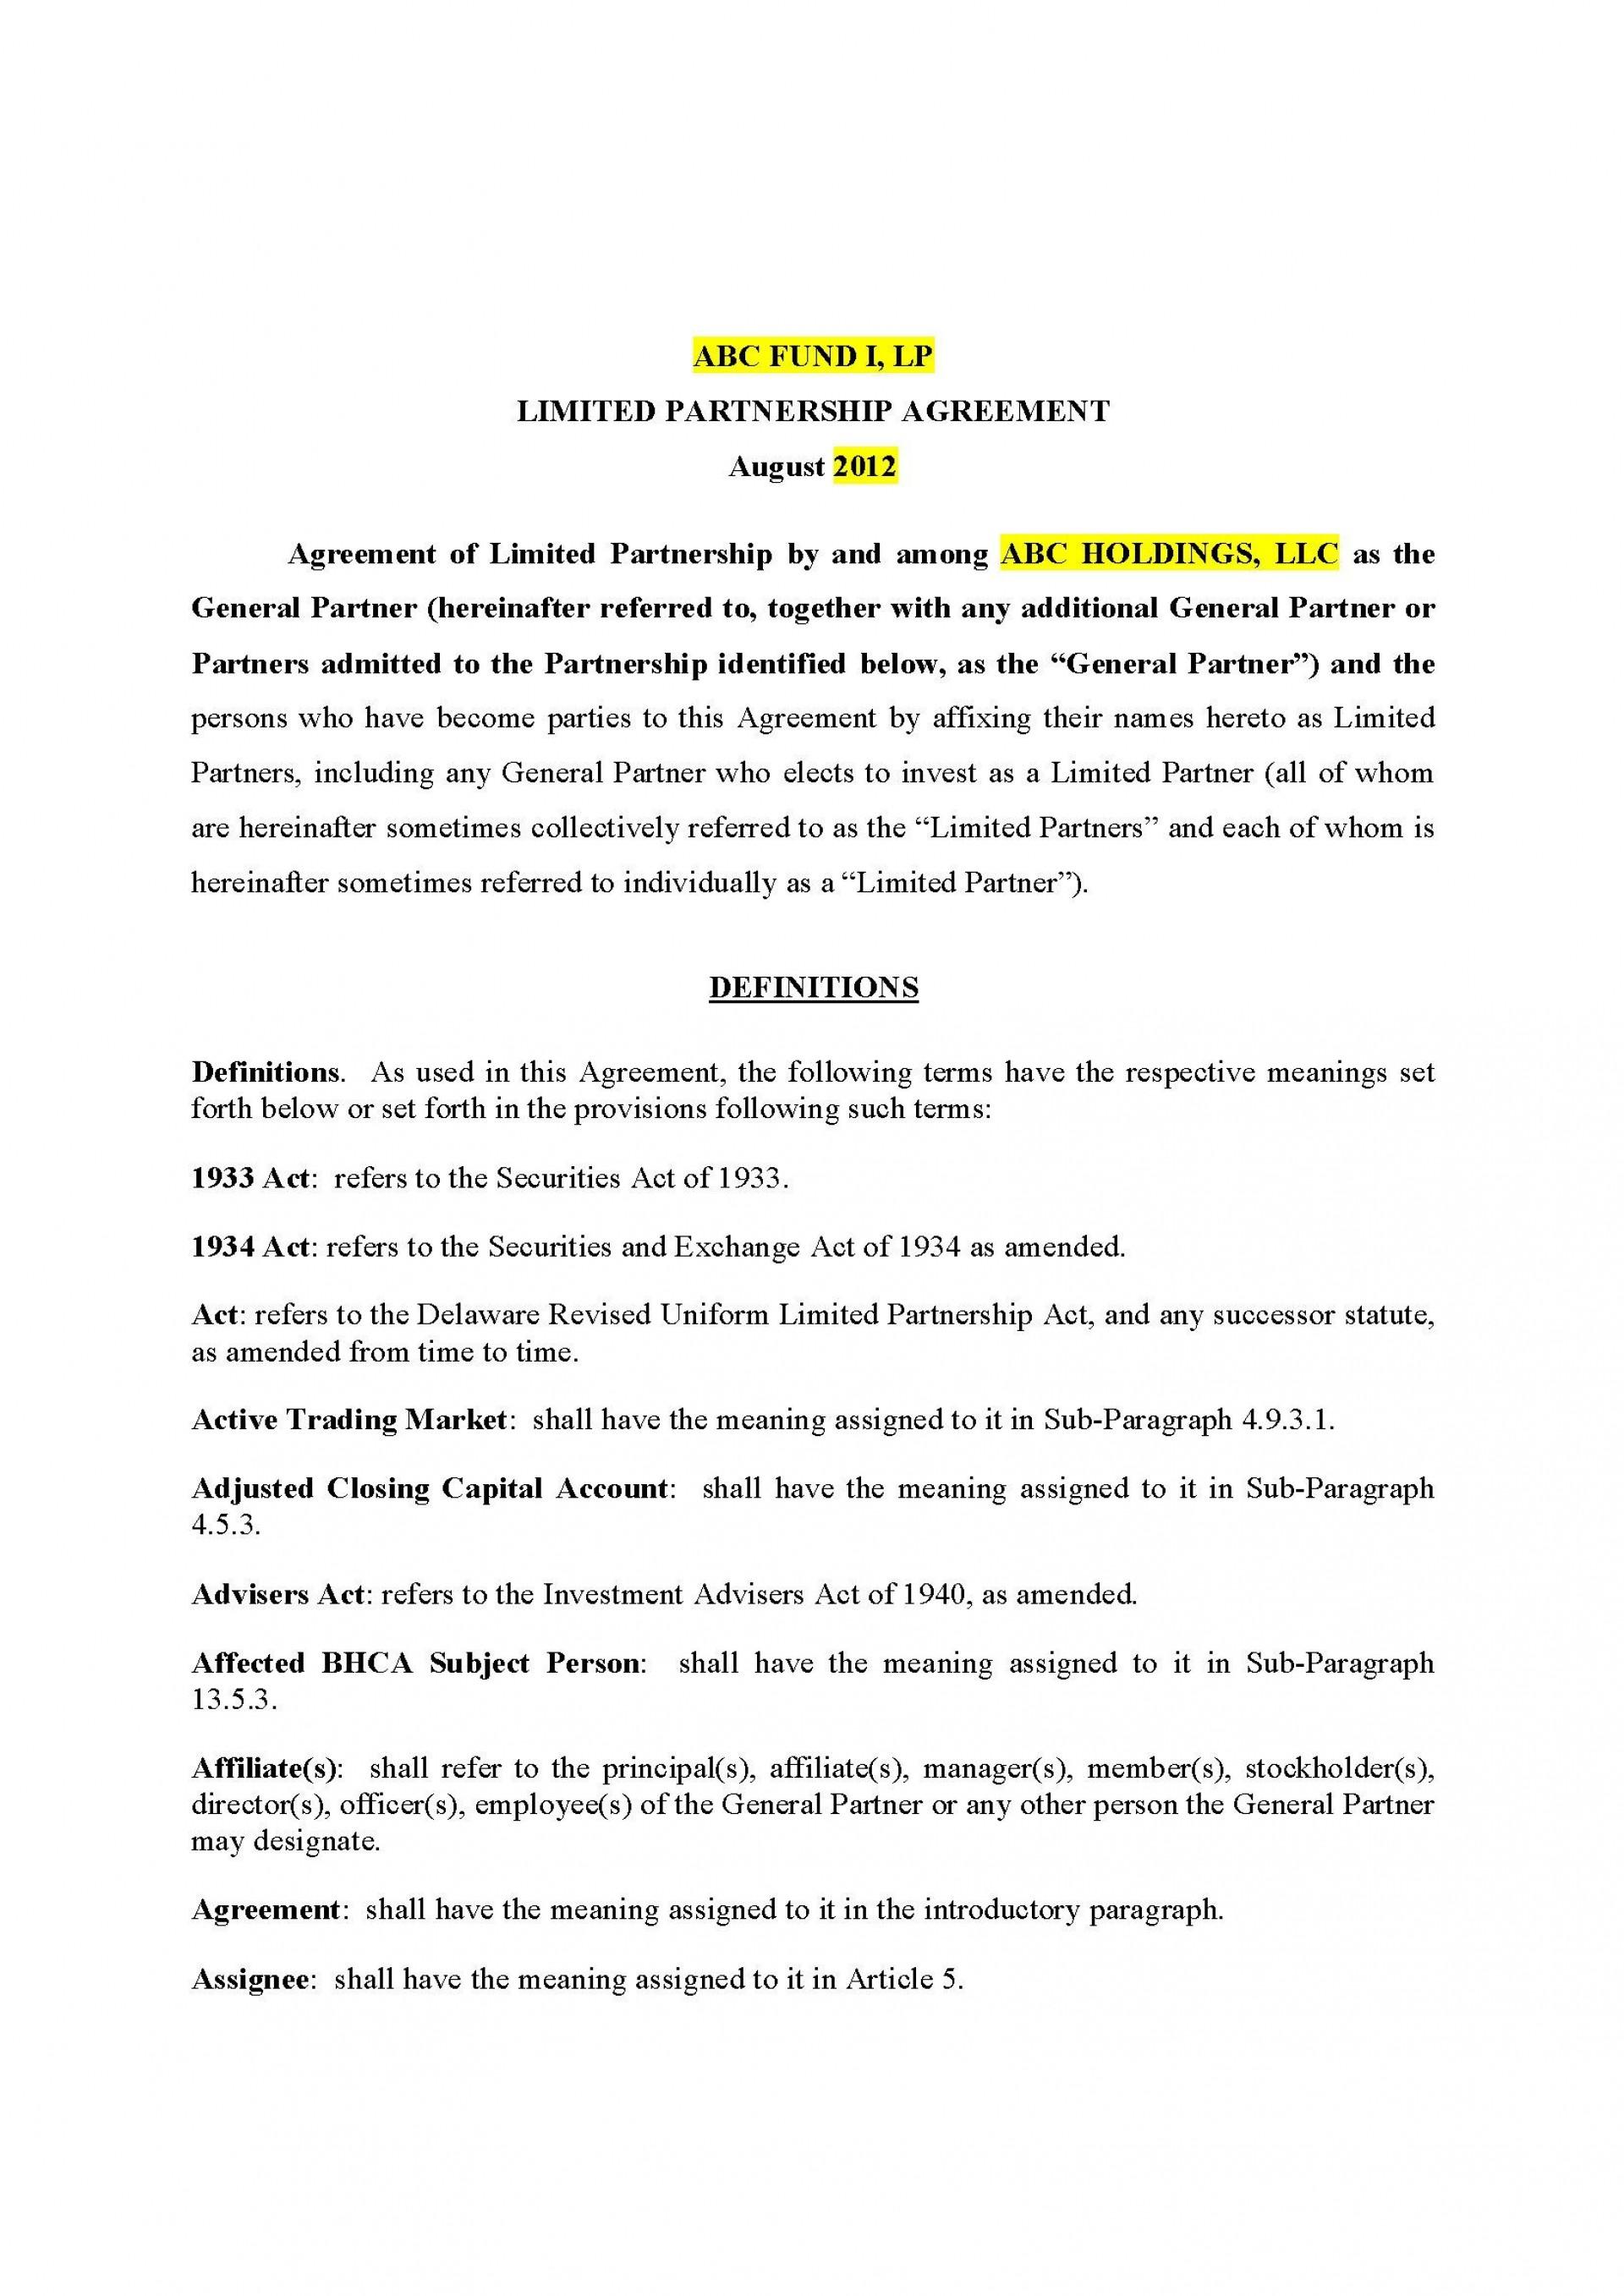 002 Surprising General Partnership Agreement Template Canada Design 1920